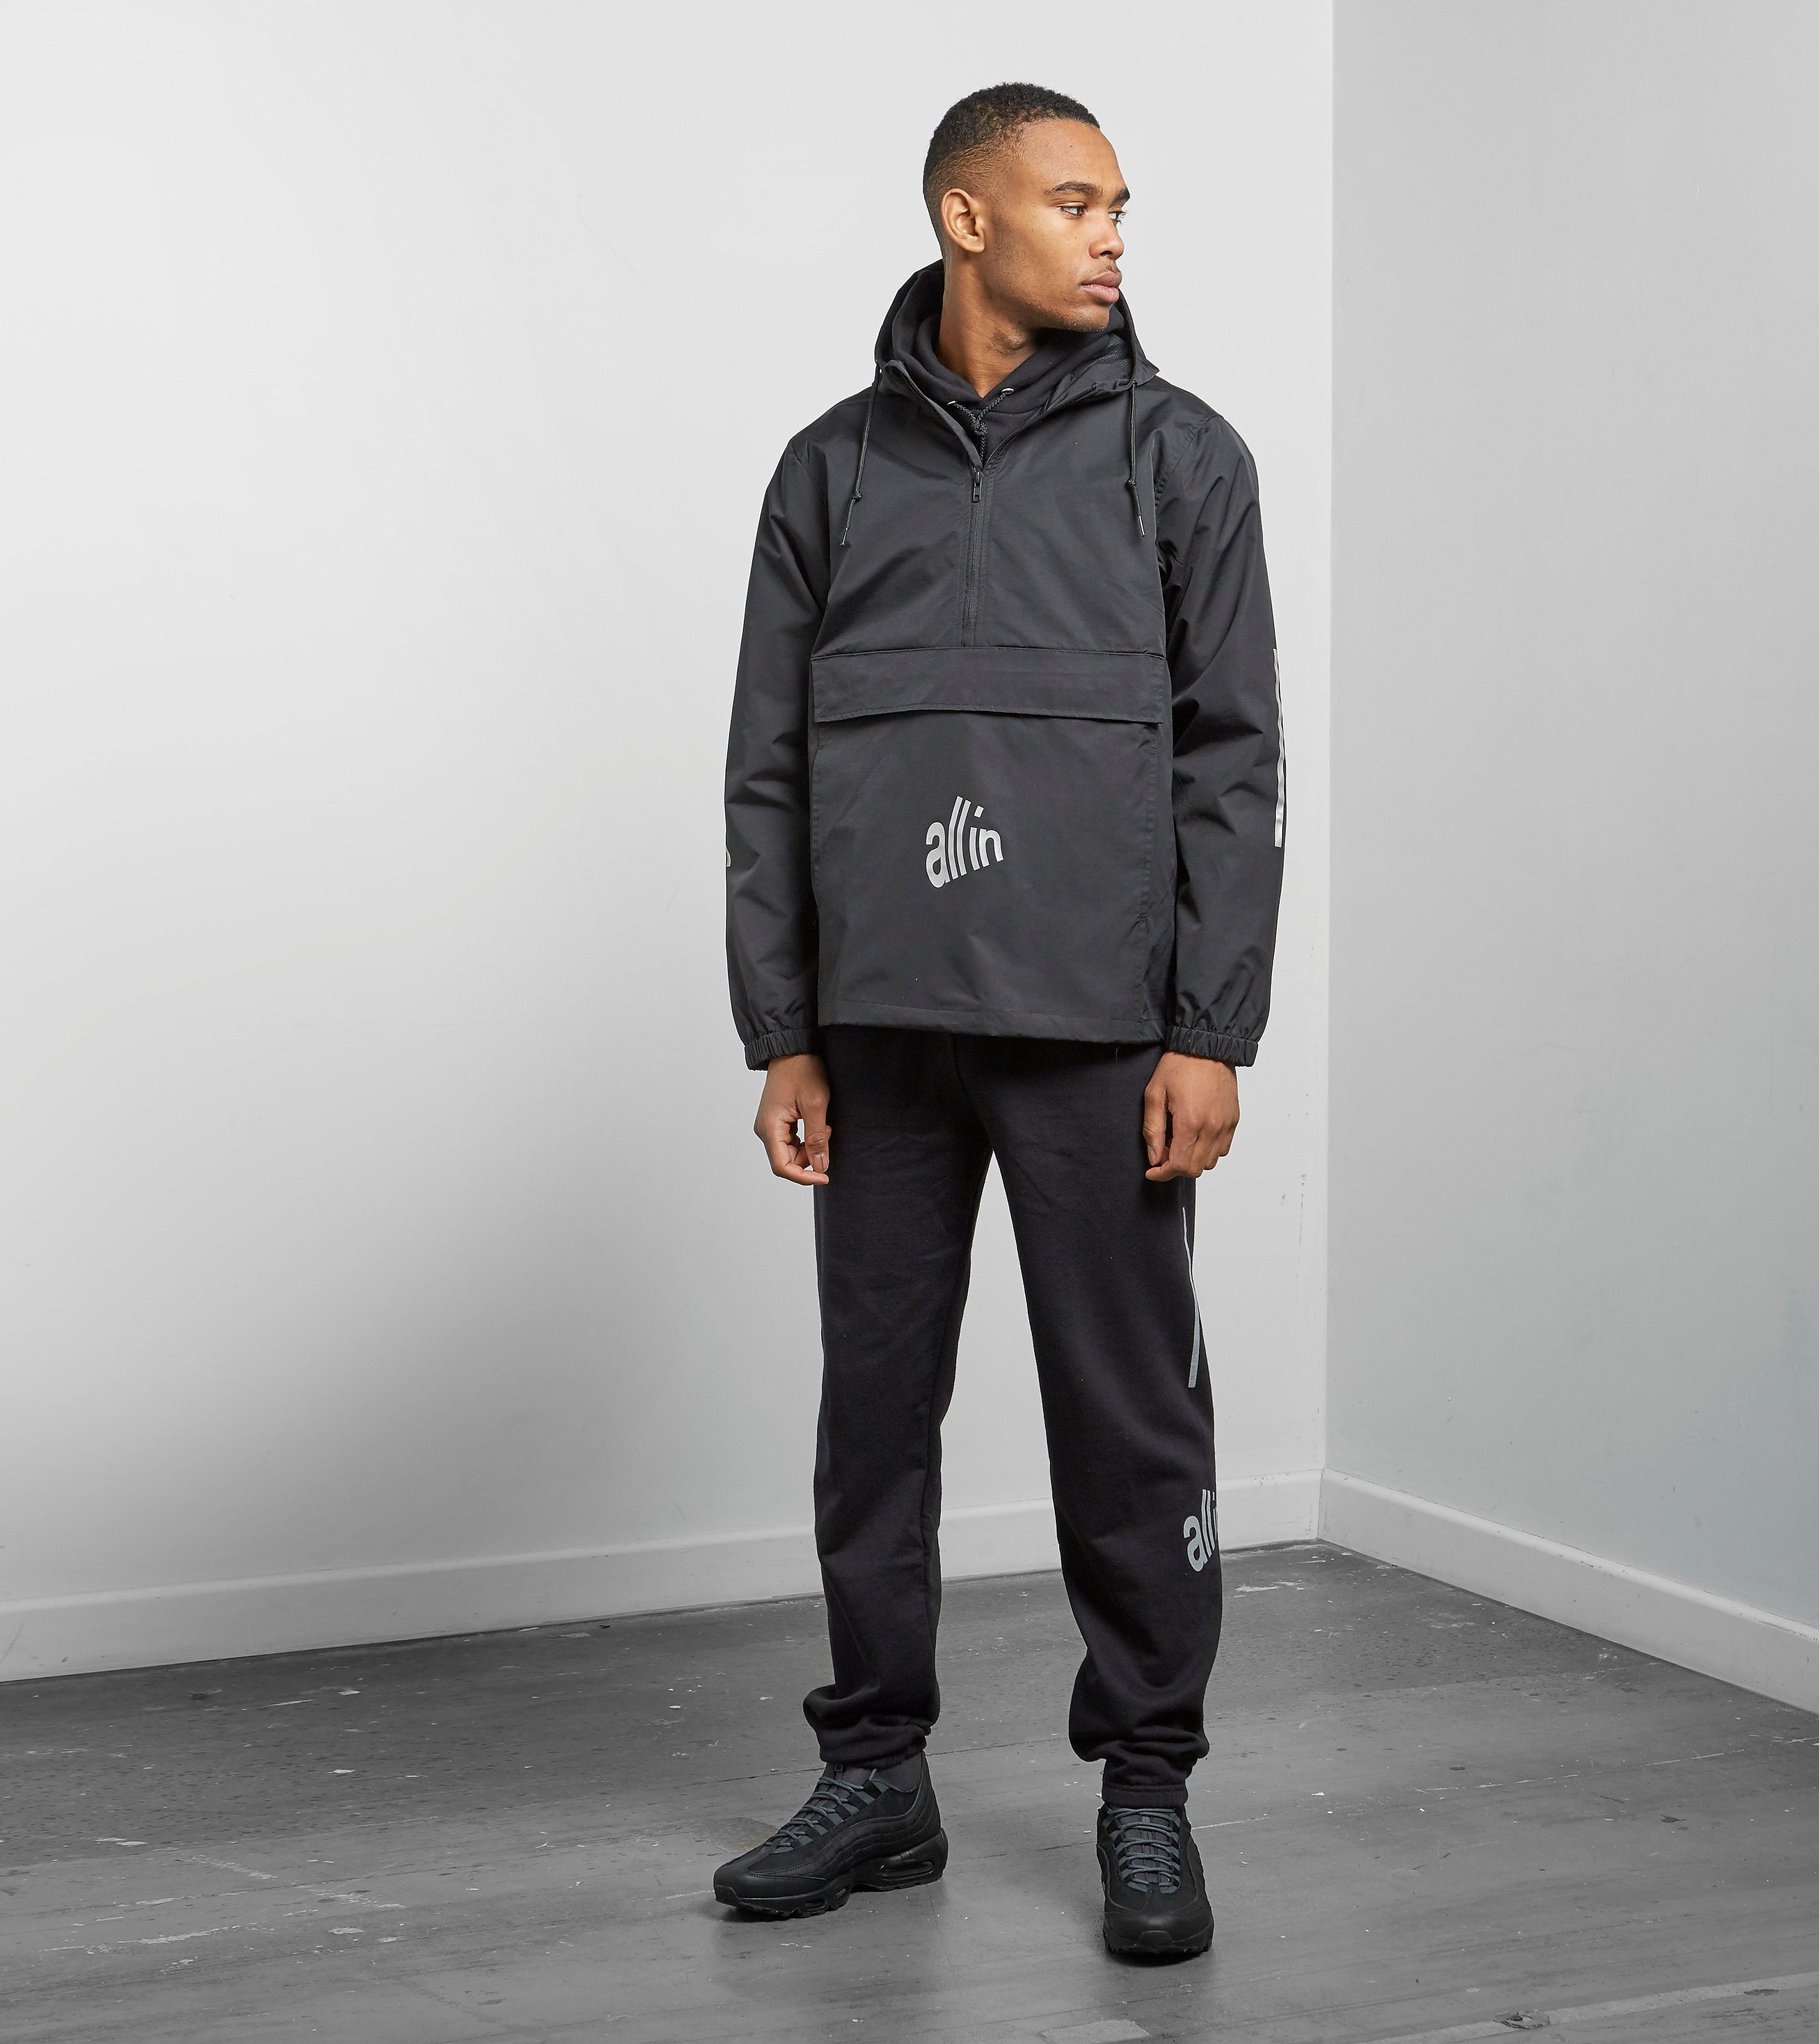 all in Signal Half Zip Jacket